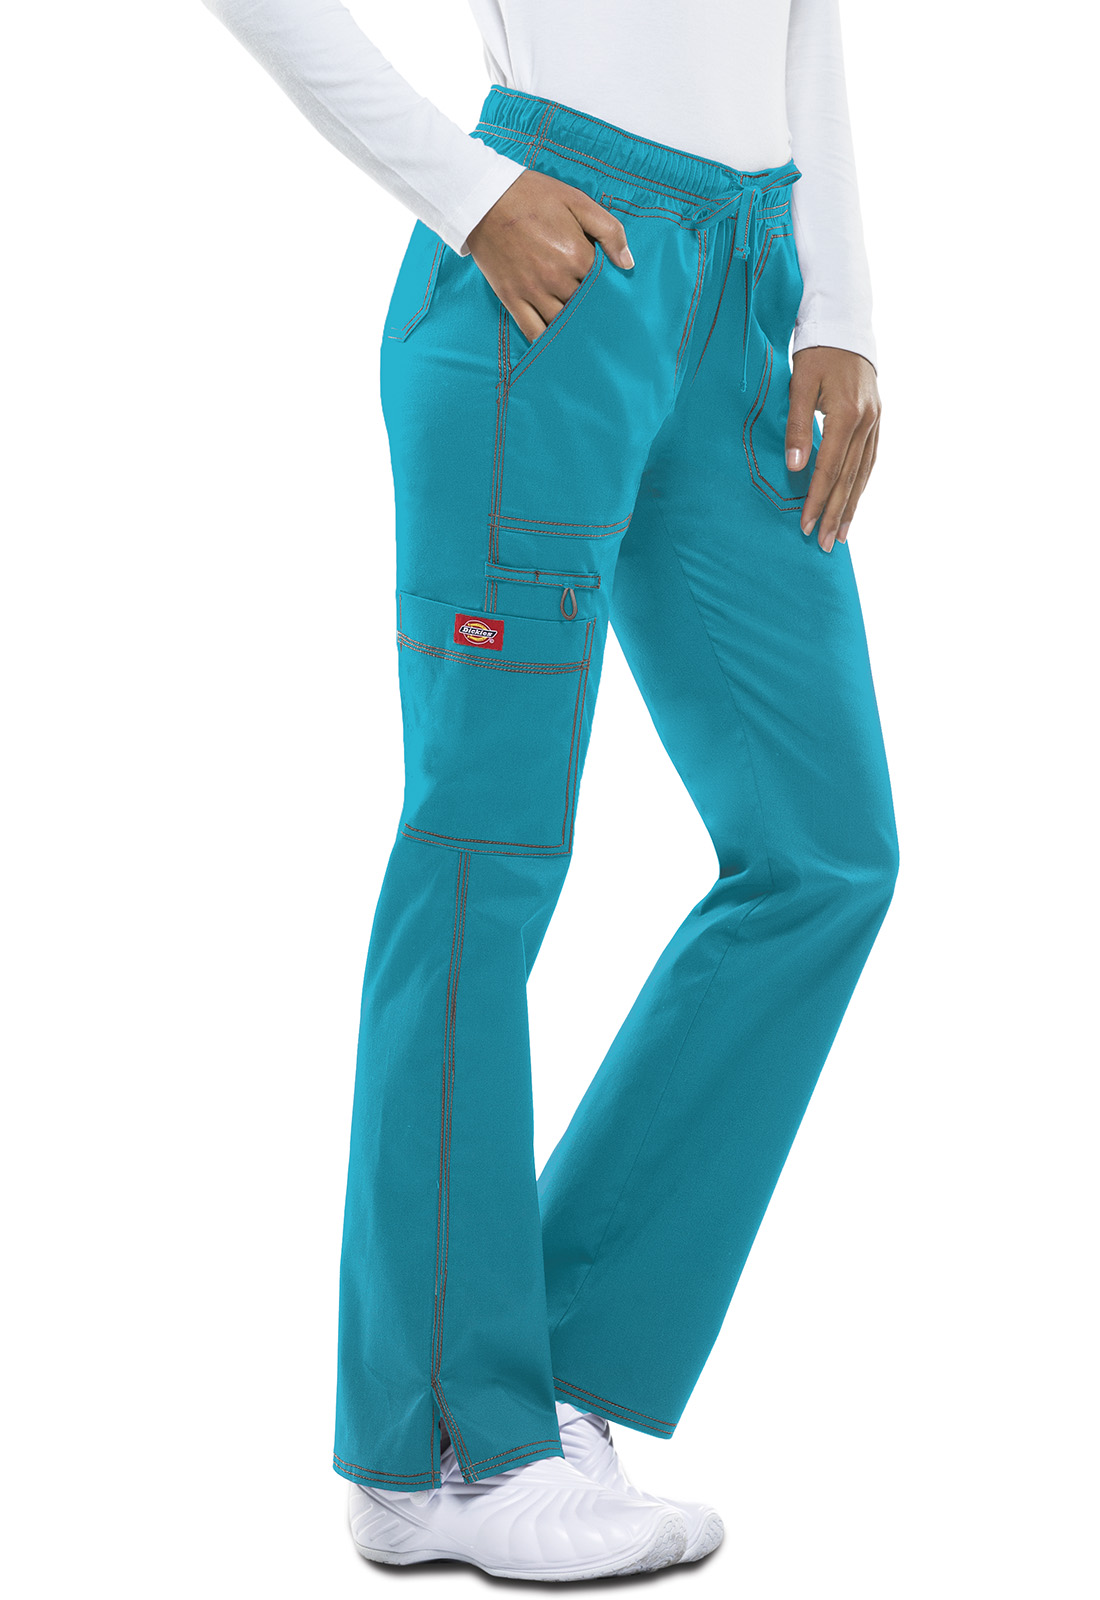 Pantalones Medicos Para Mujeres Dickies Genflex Dk100